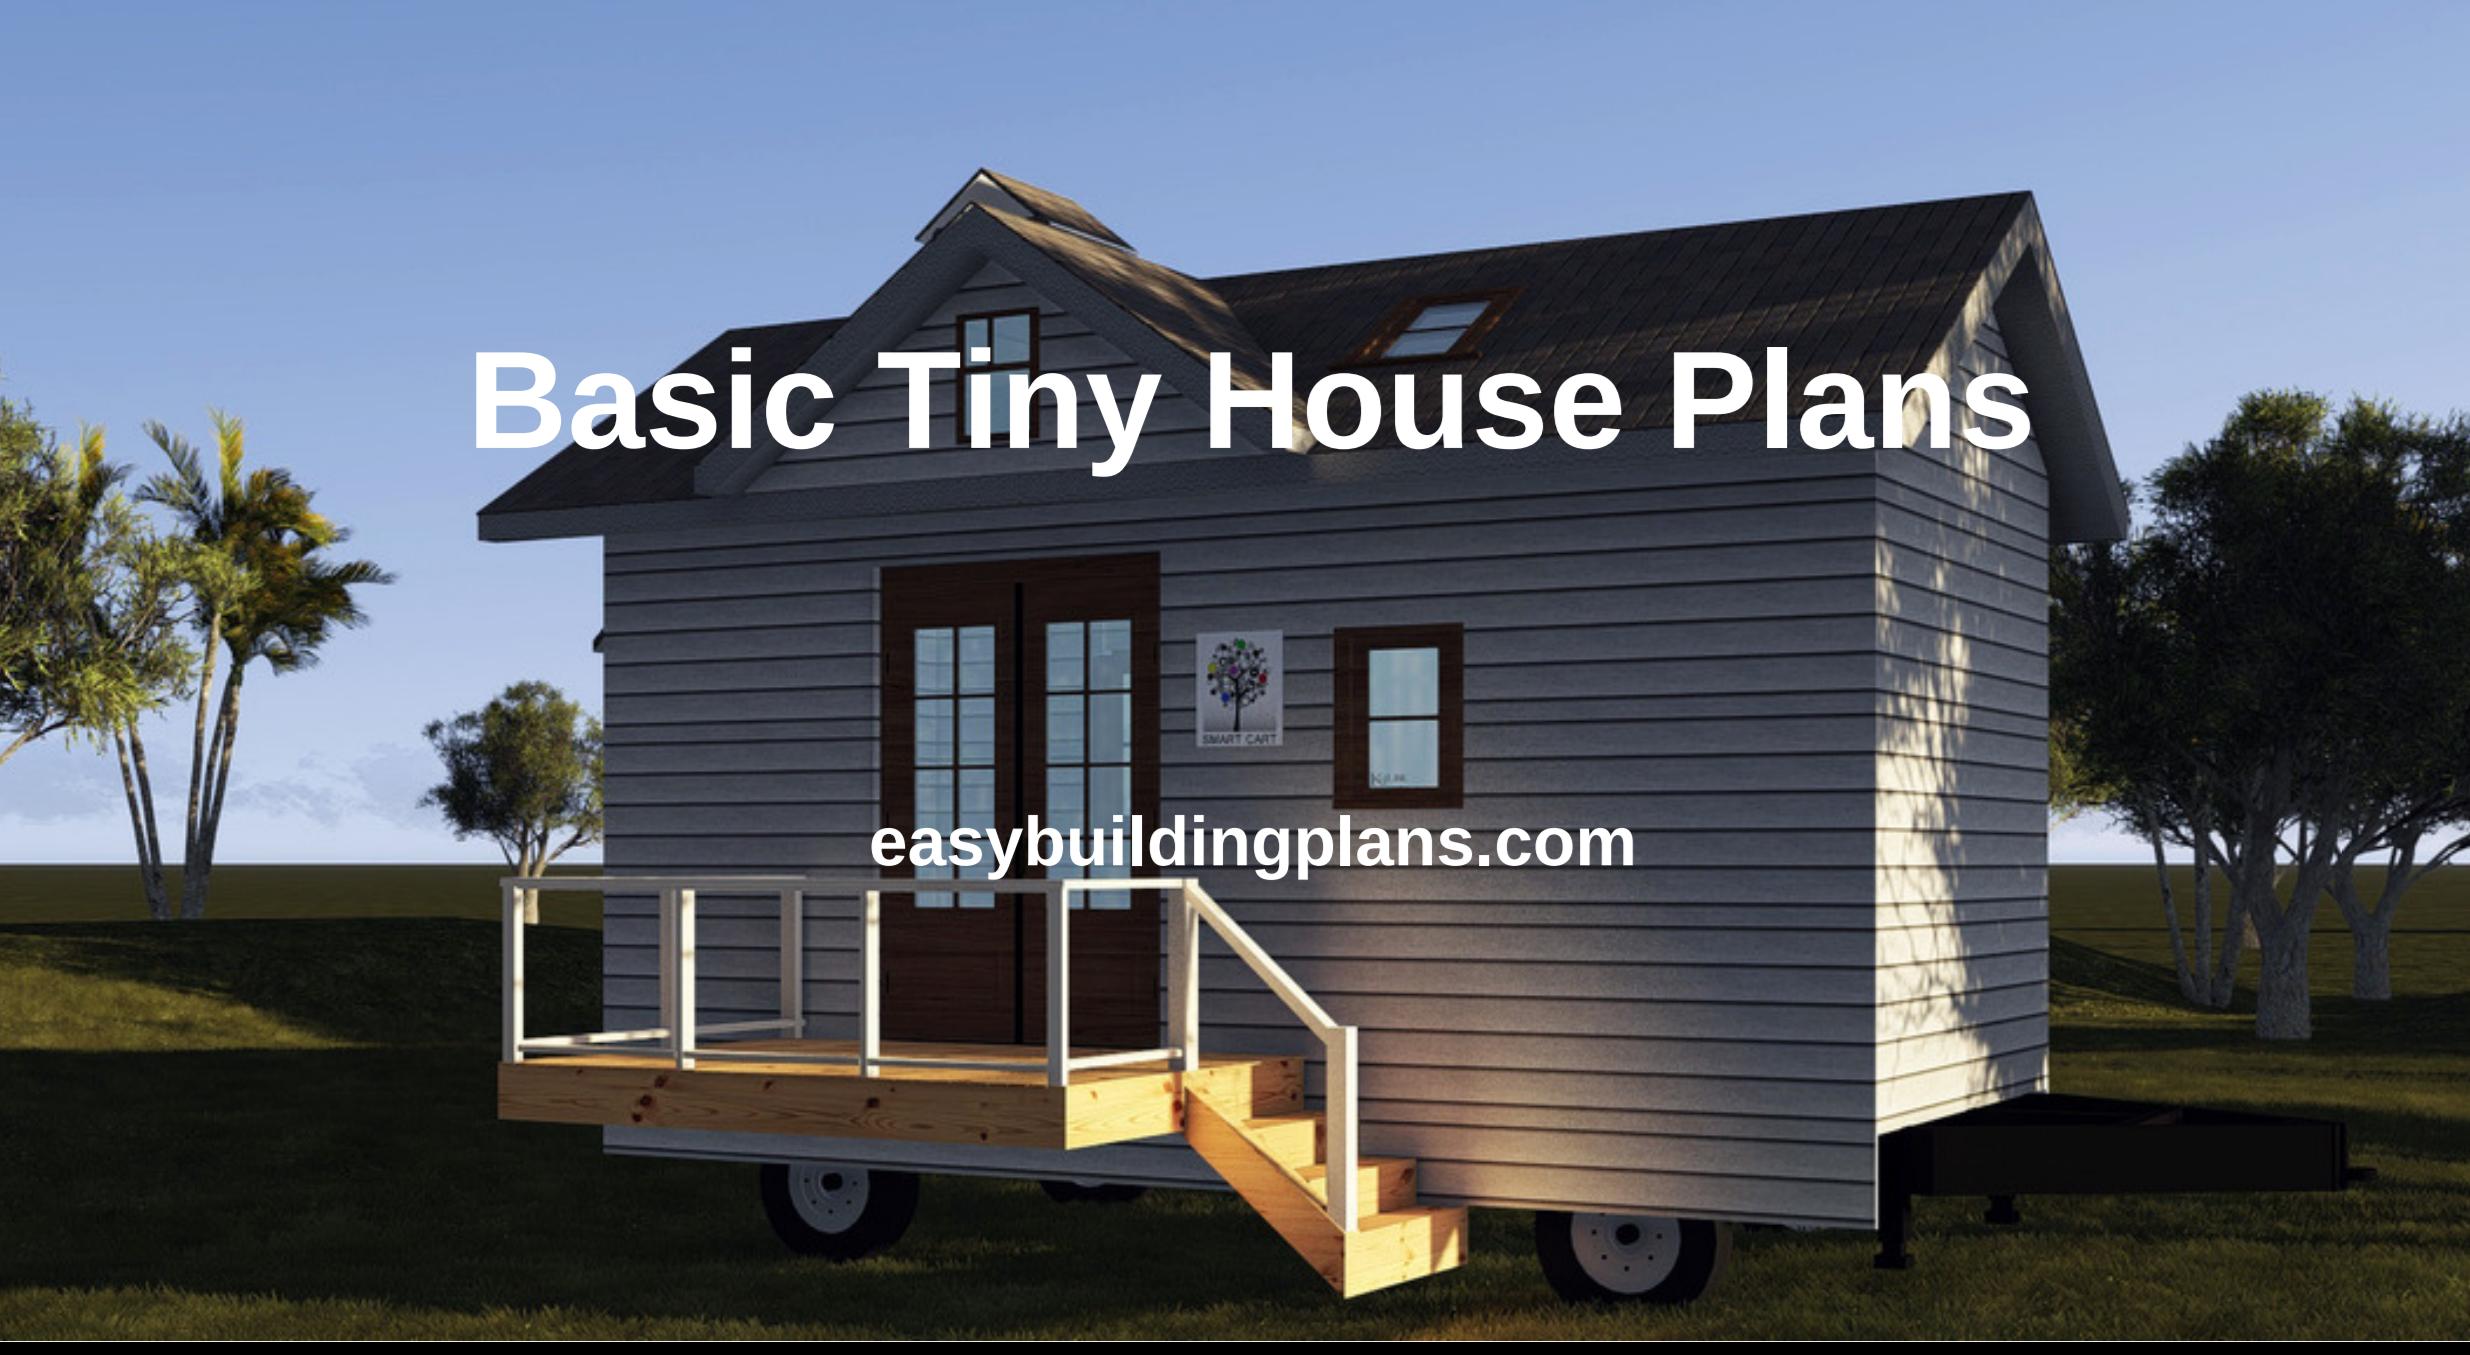 Basic Tiny House Plans